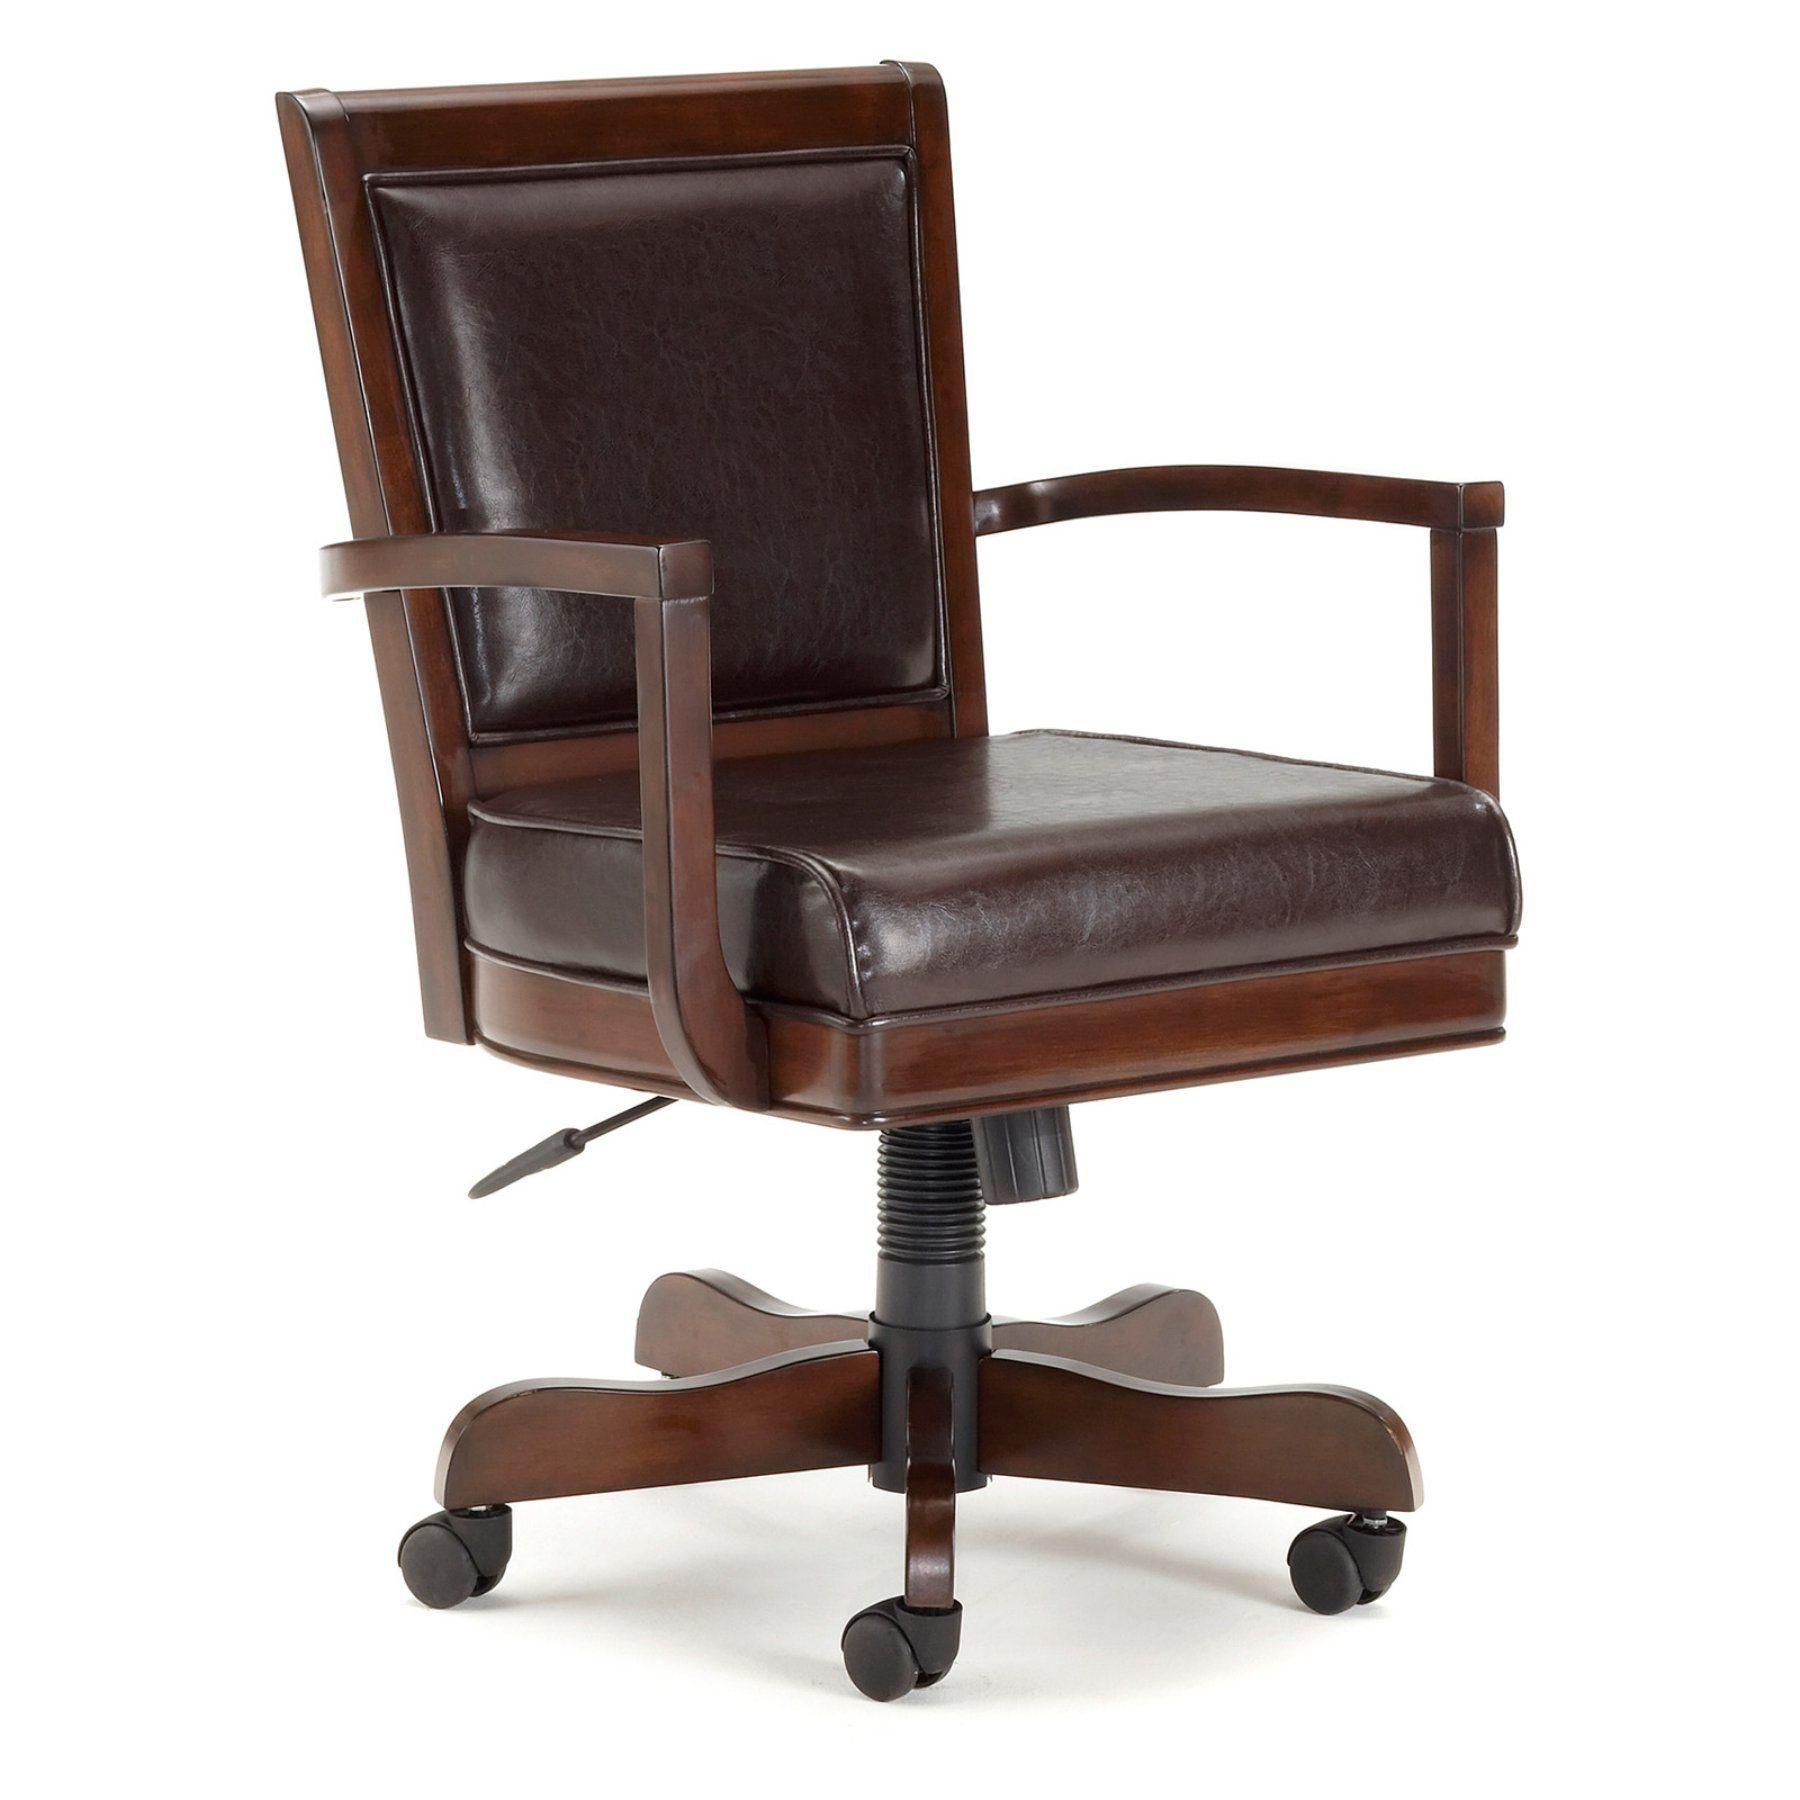 Hillsdale Ambassador Office Chair 6124801B Hillsdale